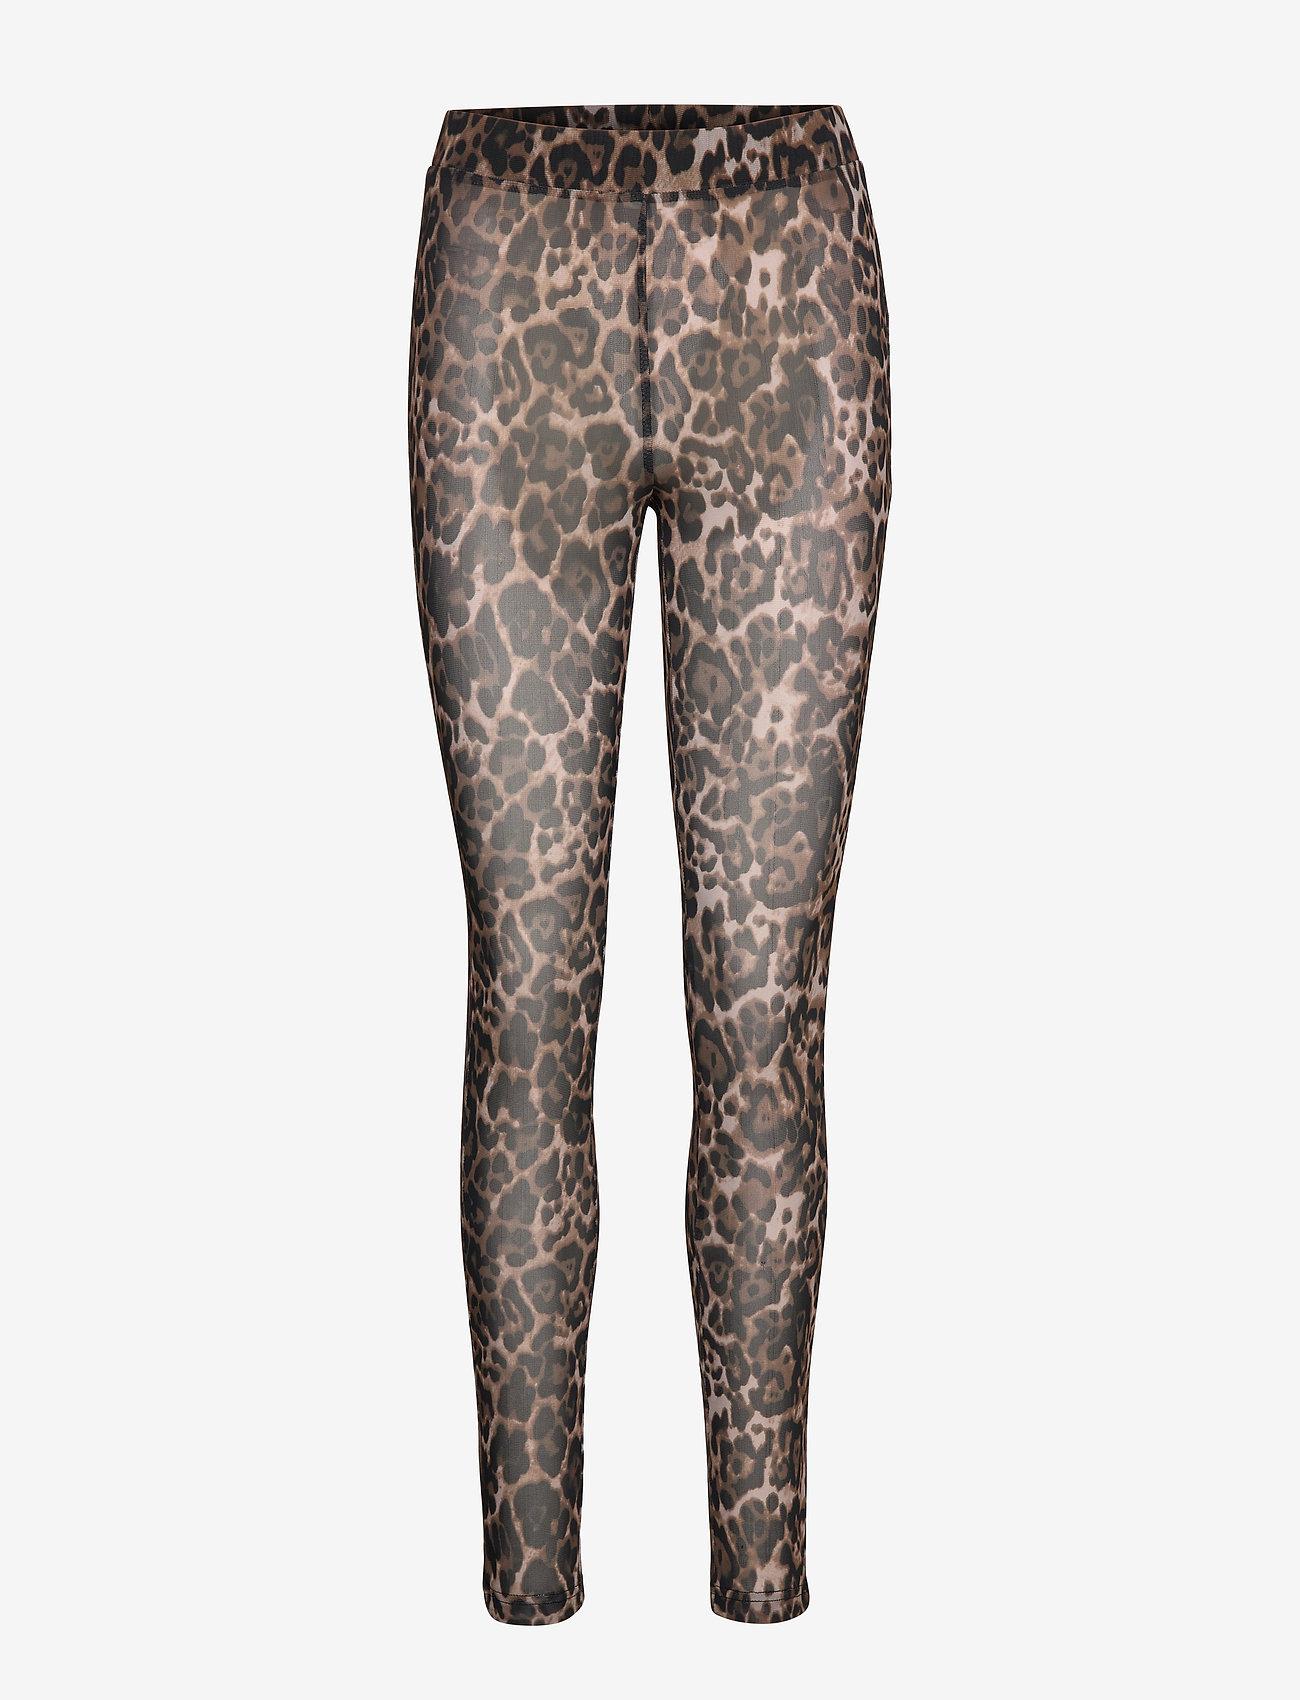 Sofie Schnoor - Leggings - leggings - light brown leopard - 0